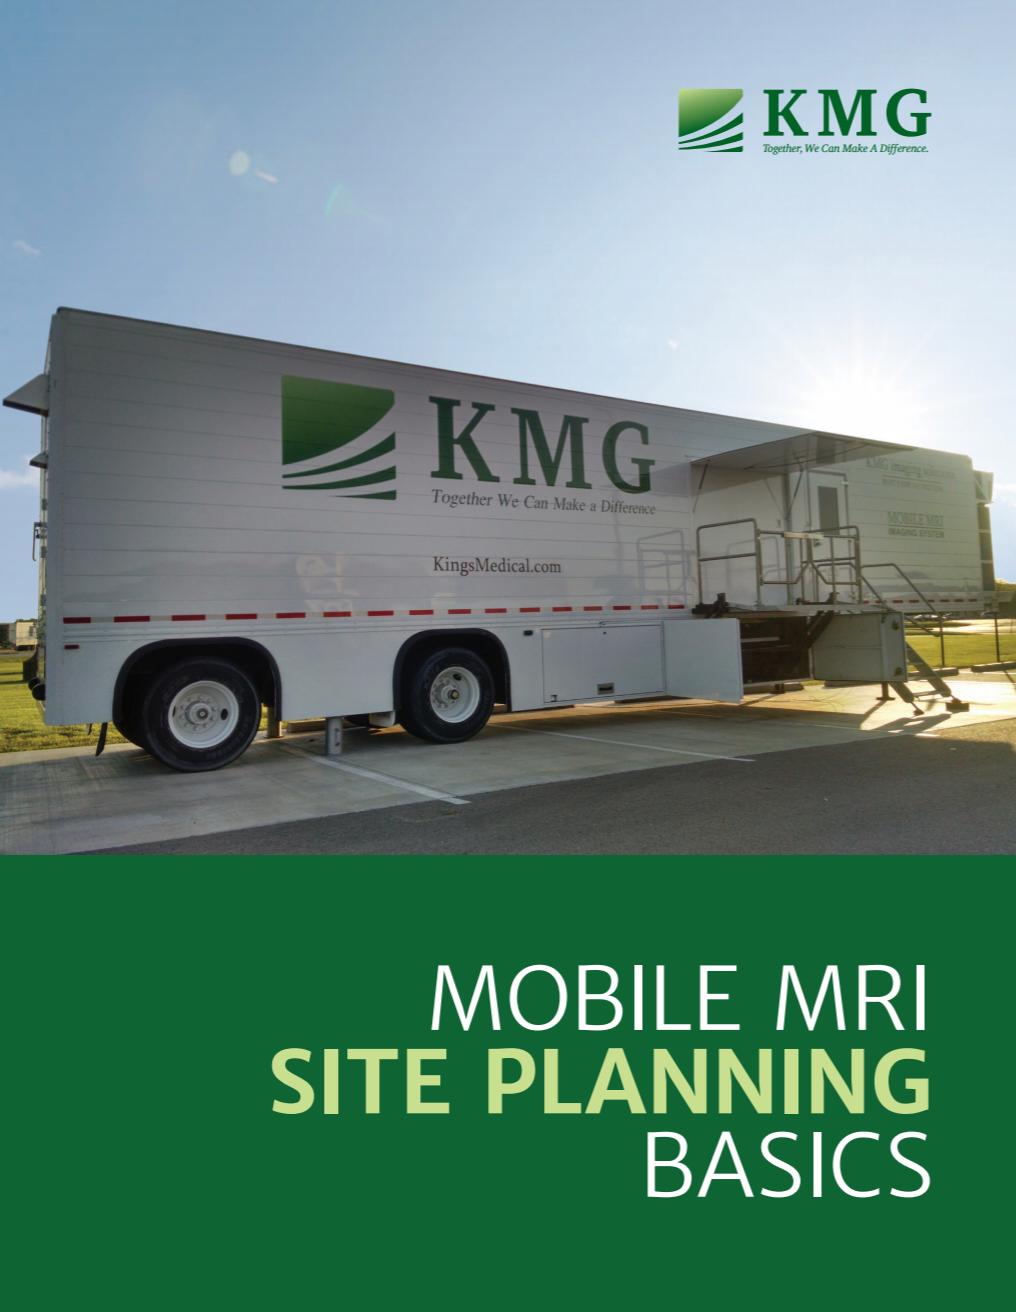 KMG Guide